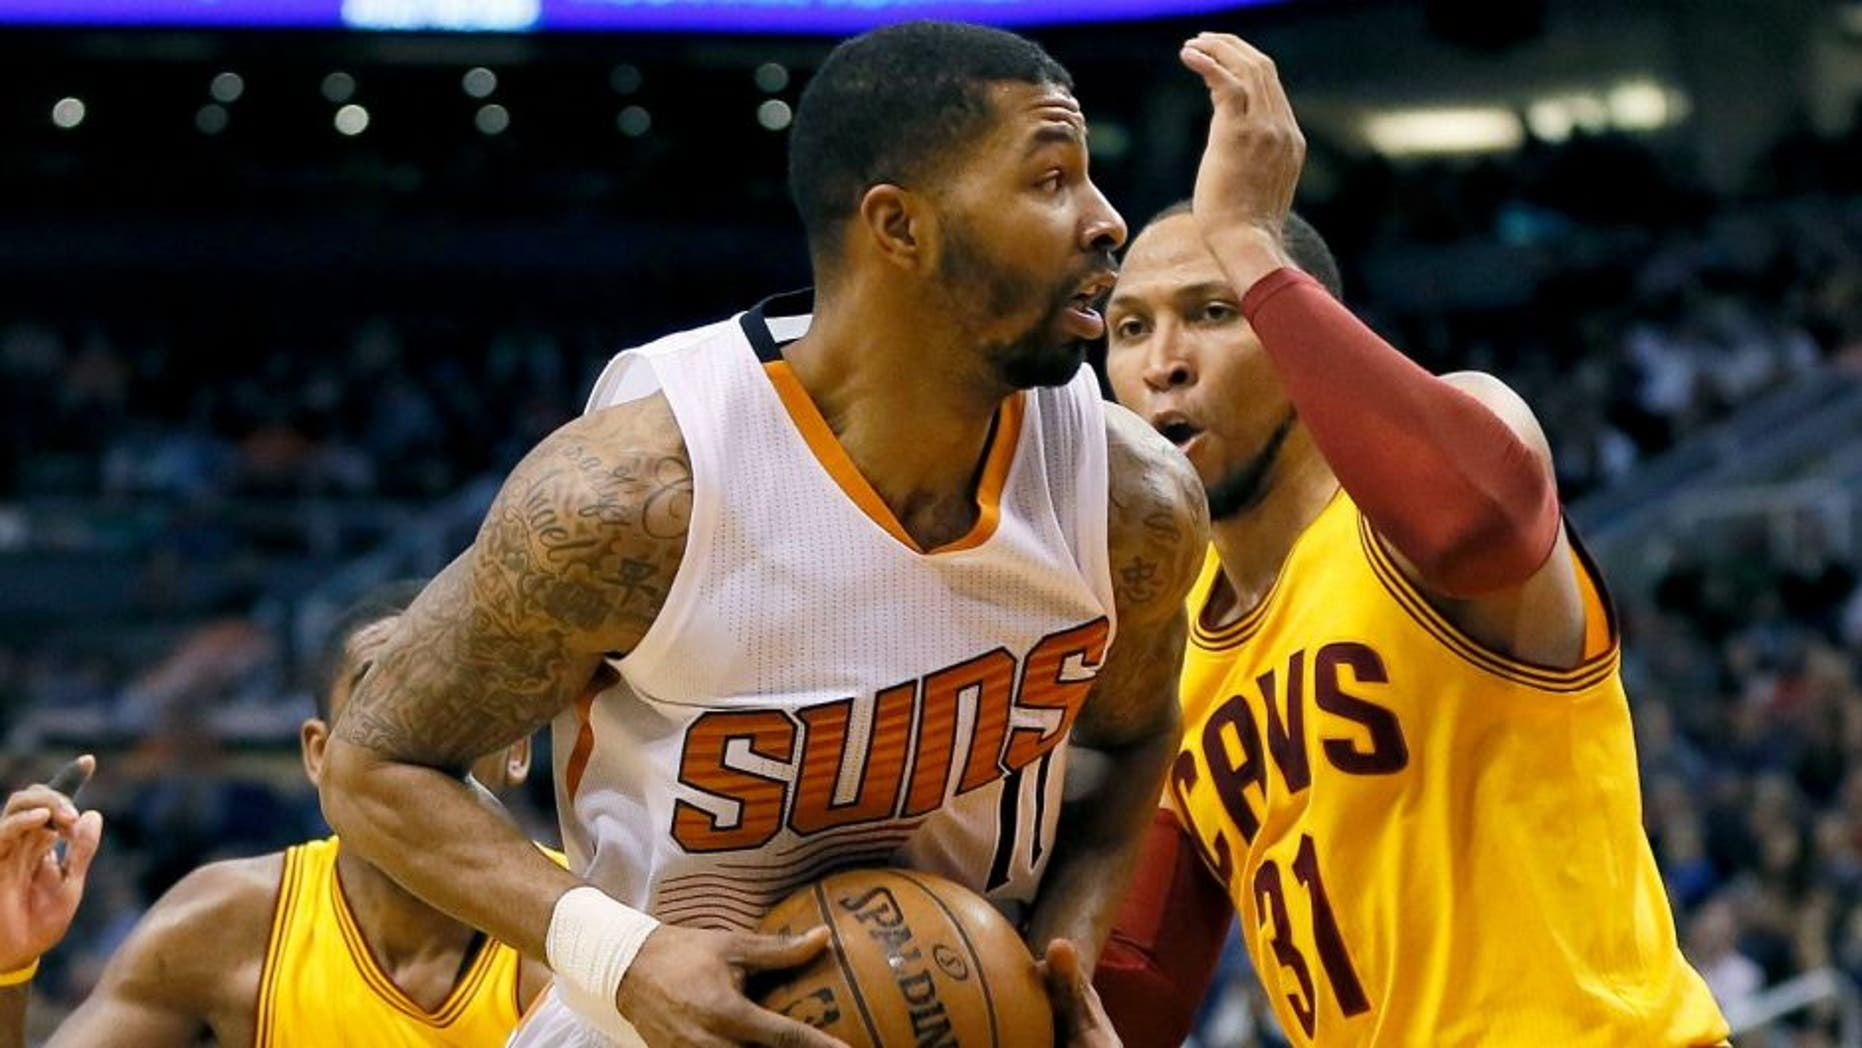 Phoenix Suns' Markieff Morris drives against Cleveland Cavaliers' Shawn Marion during the second half of an NBA basketball game, Tuesday, Jan. 13, 2015, in Phoenix. The Suns won 107-100. (AP Photo/Matt York)